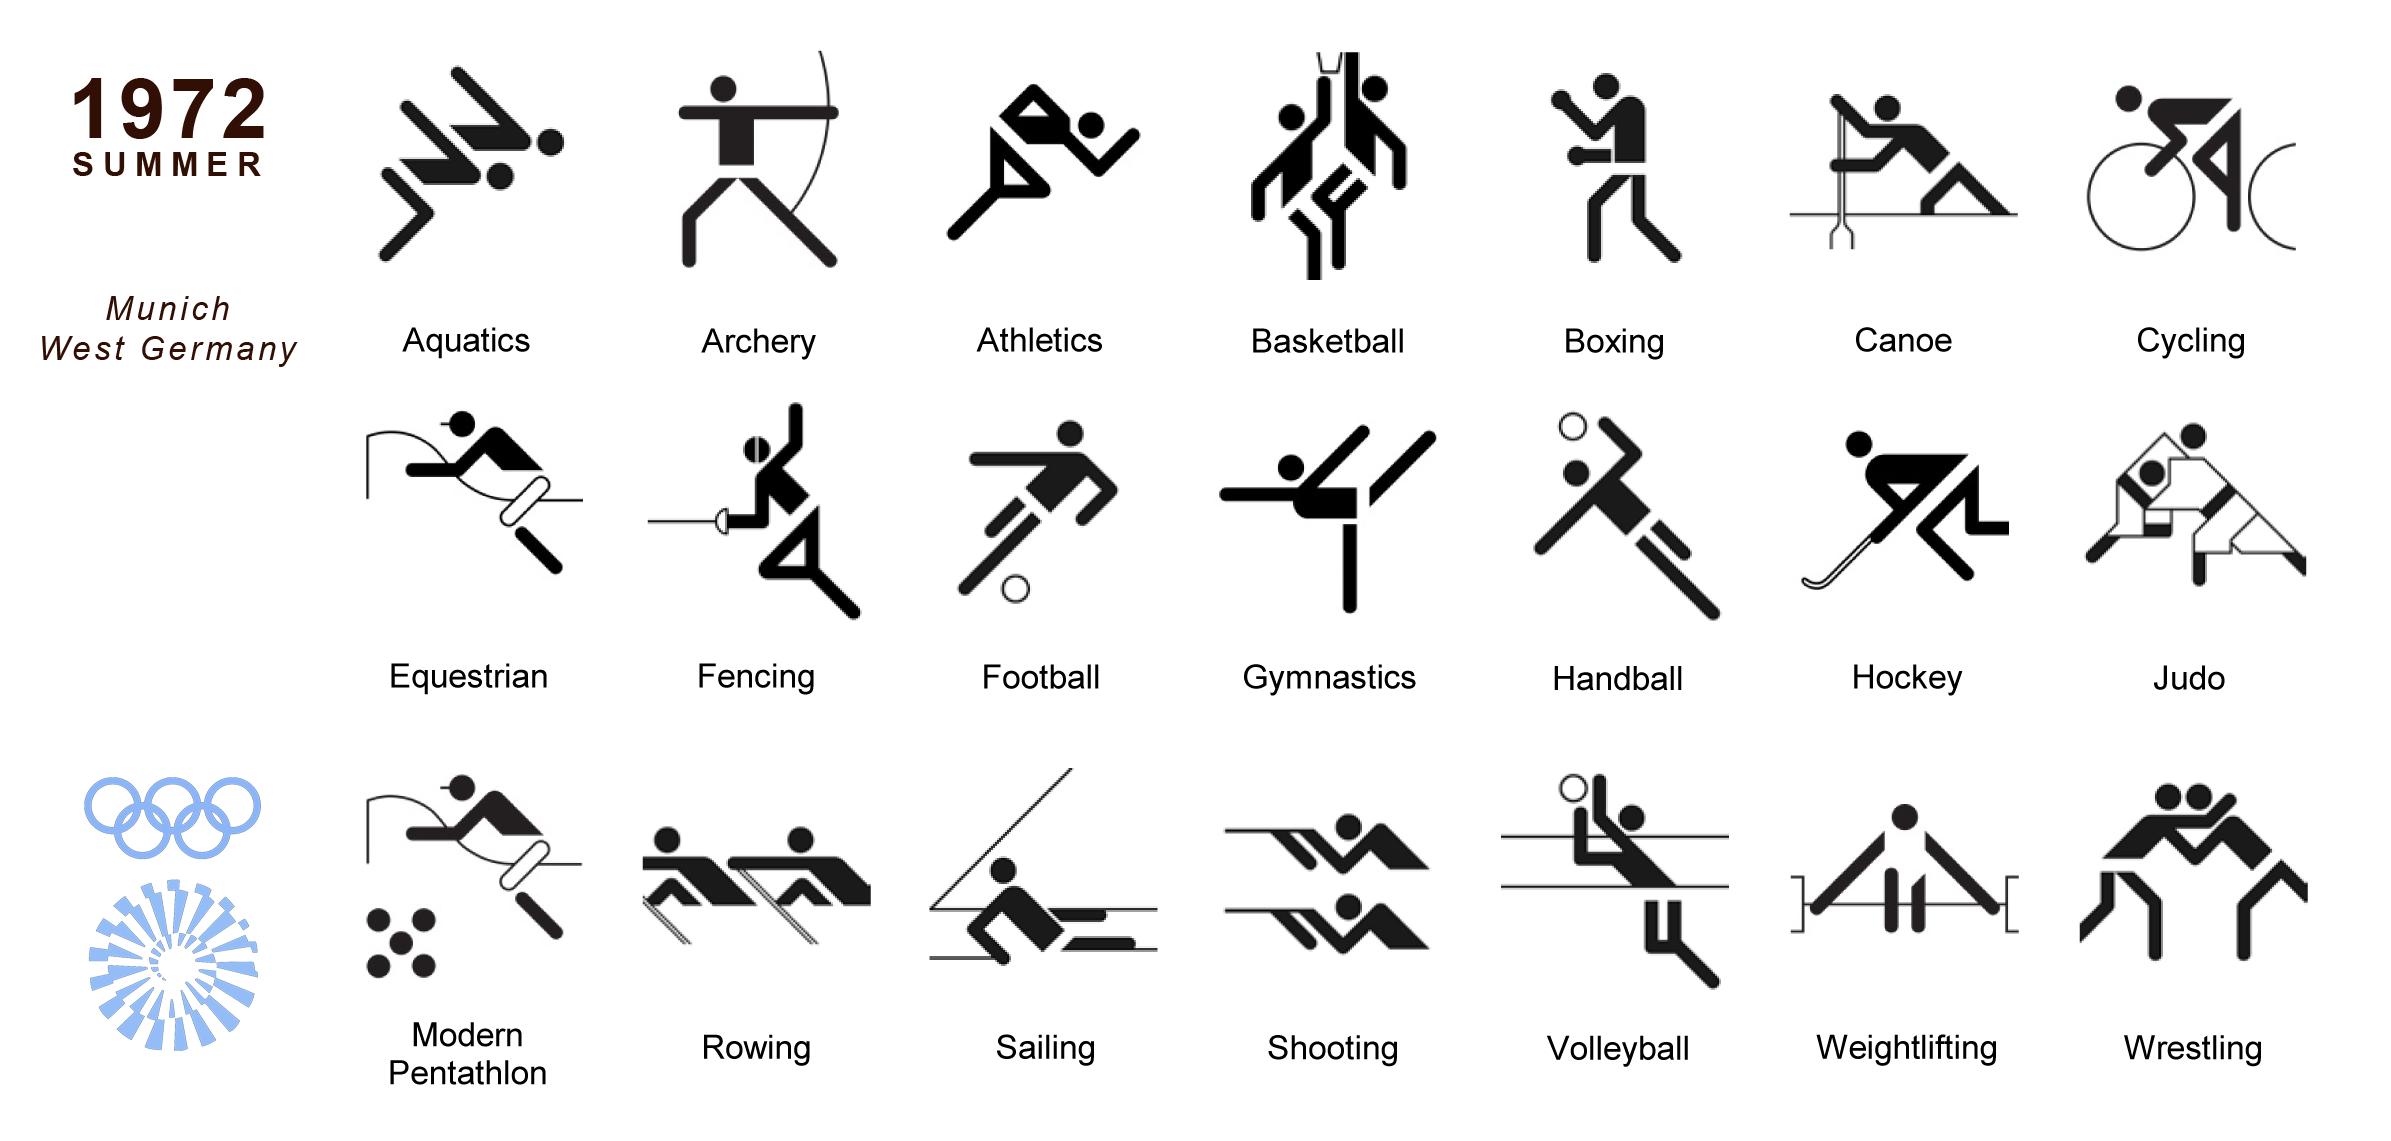 Kptallat a kvetkezre pictograms of olympic sports kptallat a kvetkezre pictograms of olympic sports buycottarizona Image collections